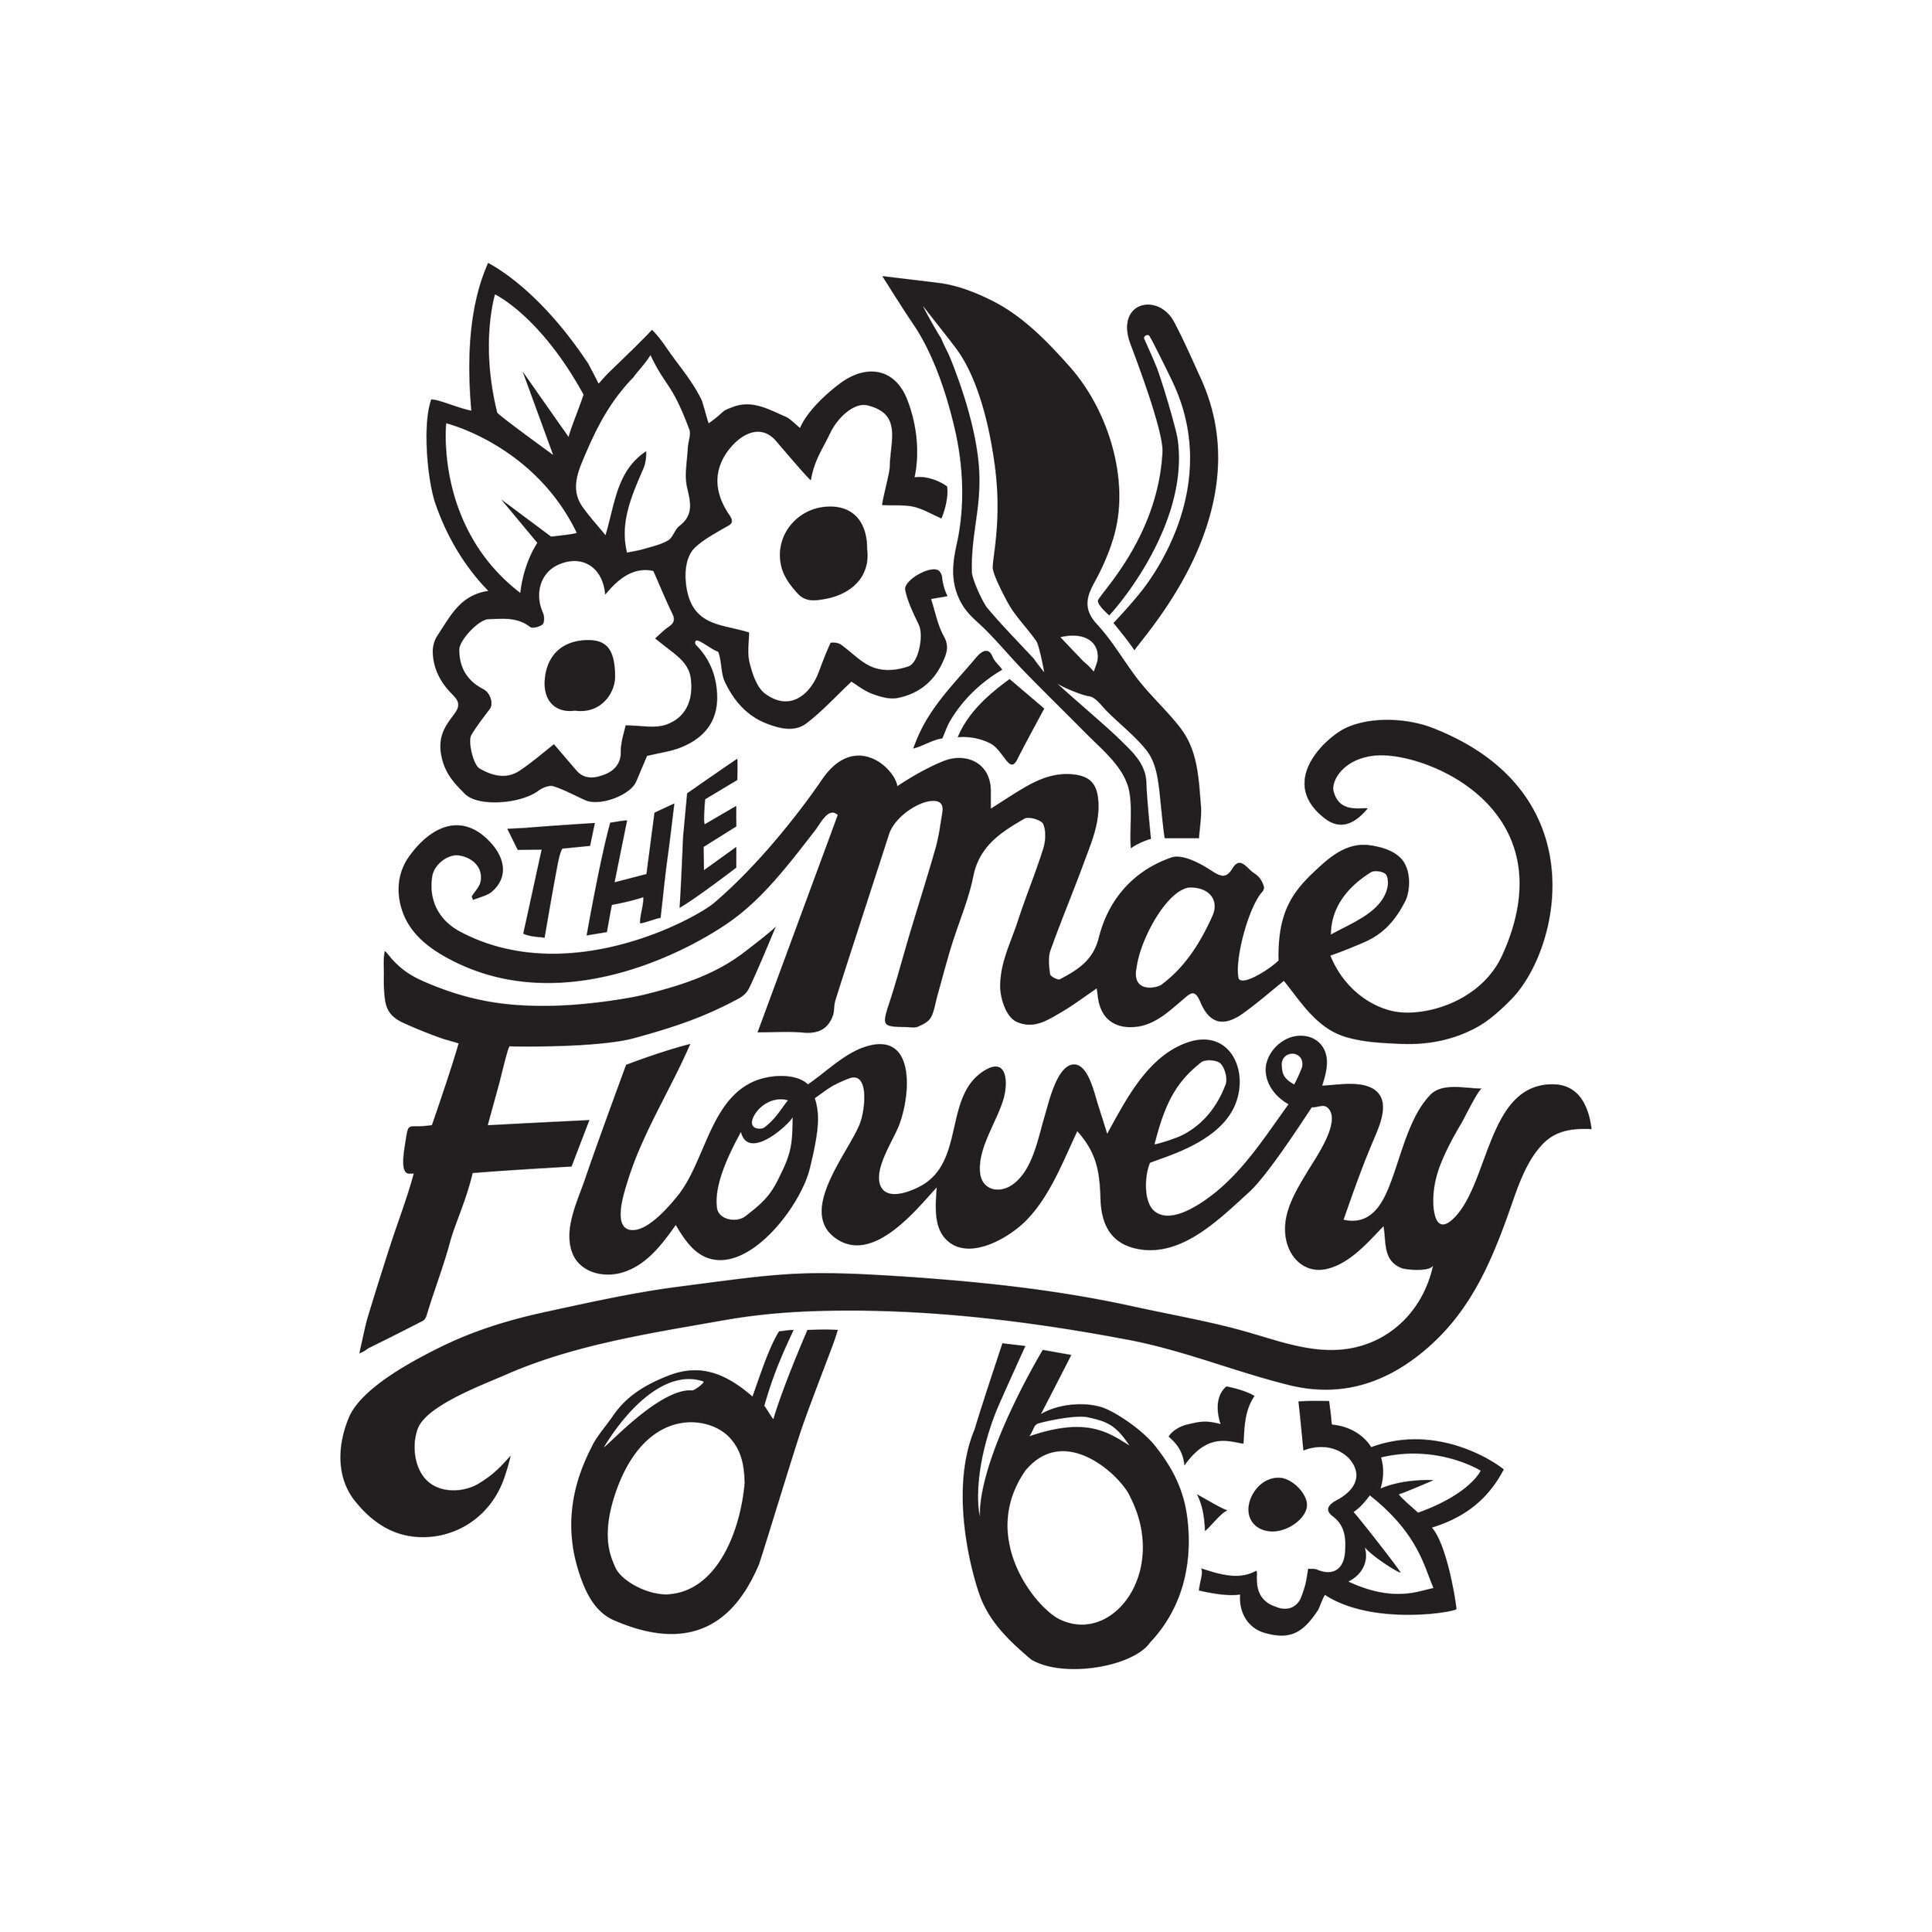 maeflowery logo with white.jpg